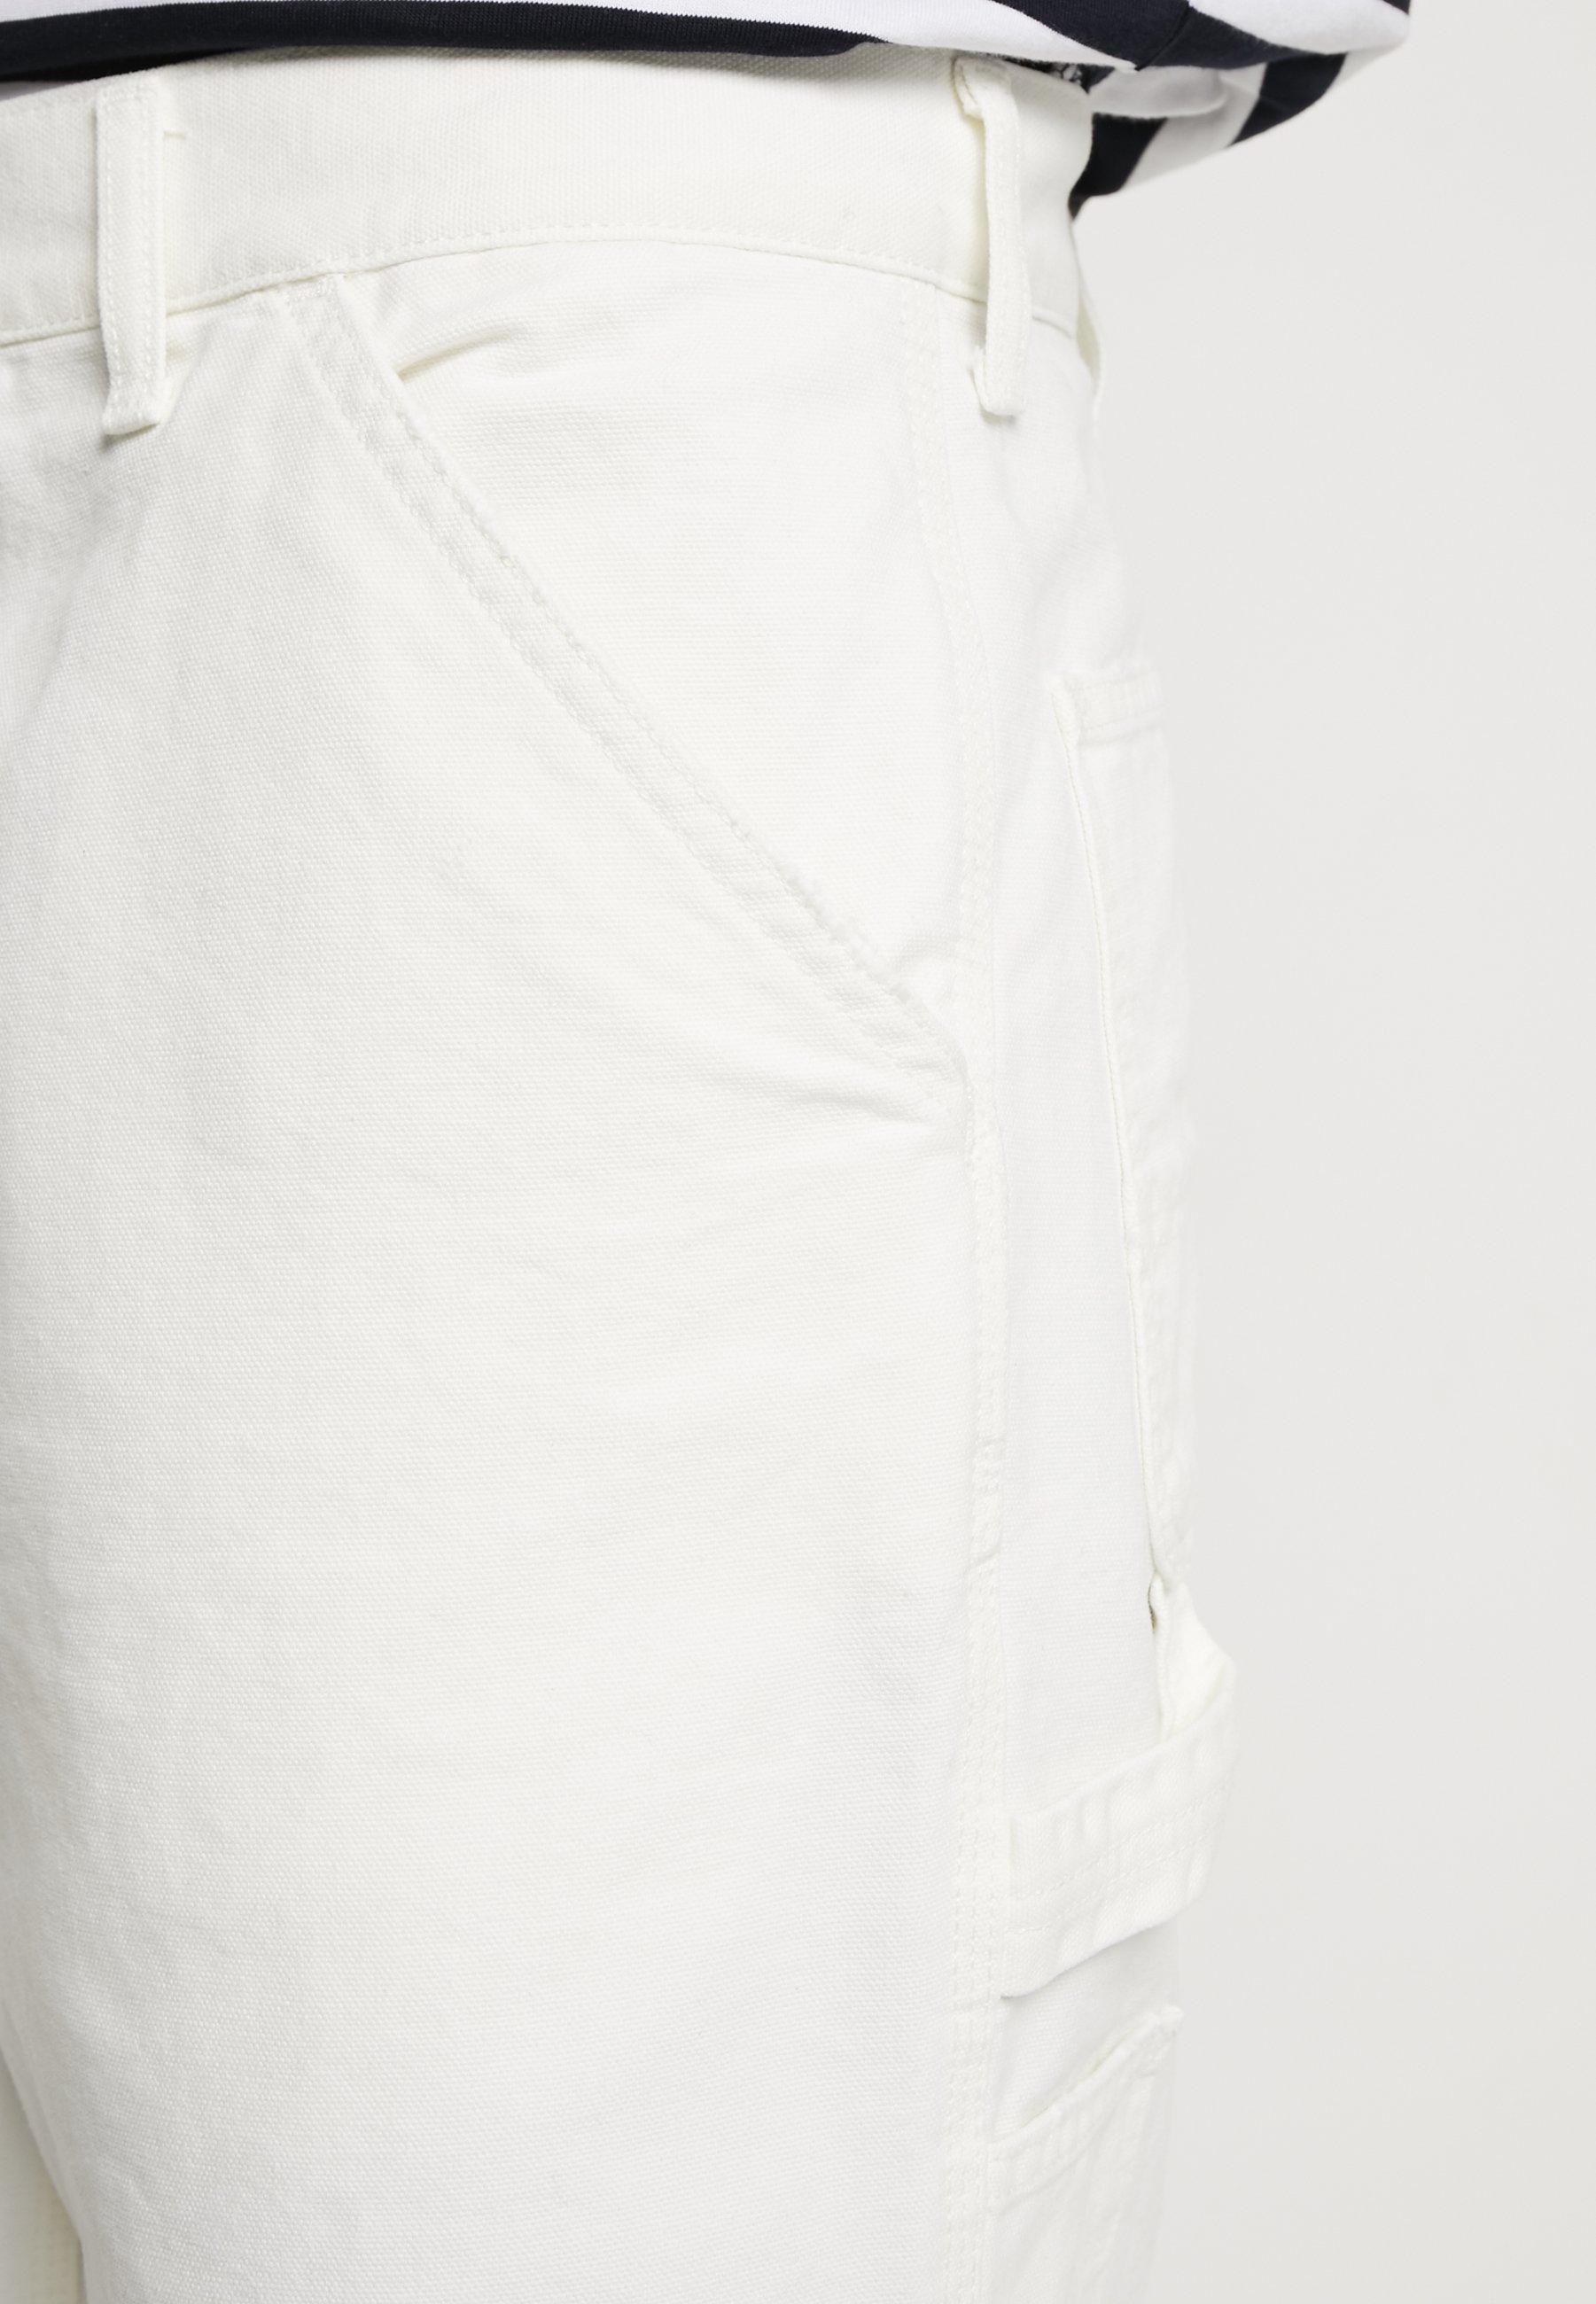 Carhartt Wip Single Knee Pant Dearborn - Straight Leg Jeans Off-white